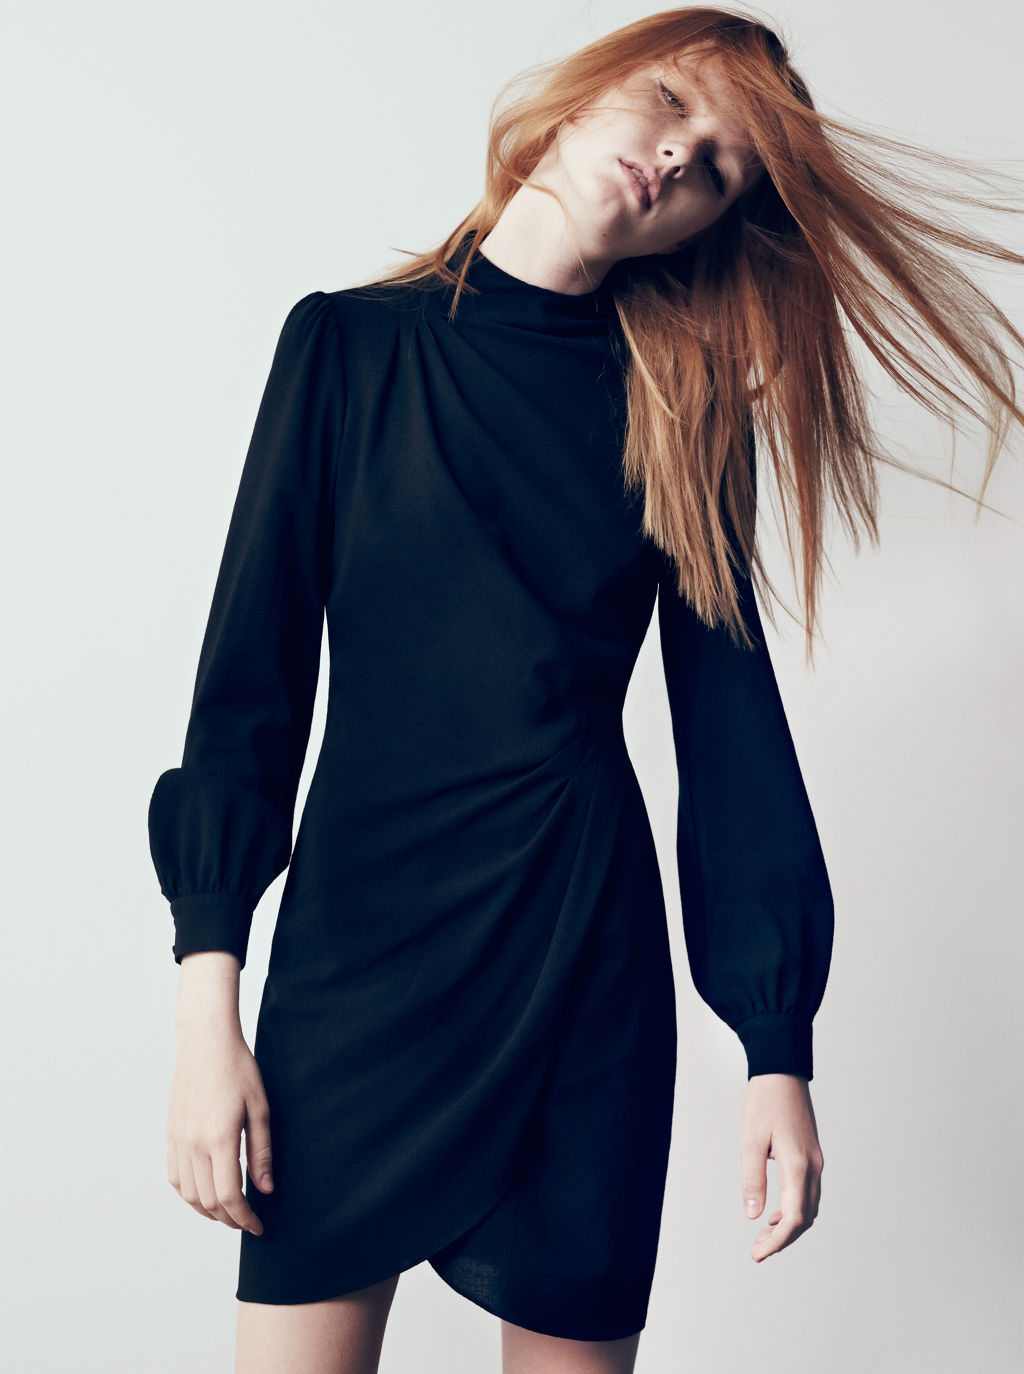 Dresses Zara usa pictures catalog photo